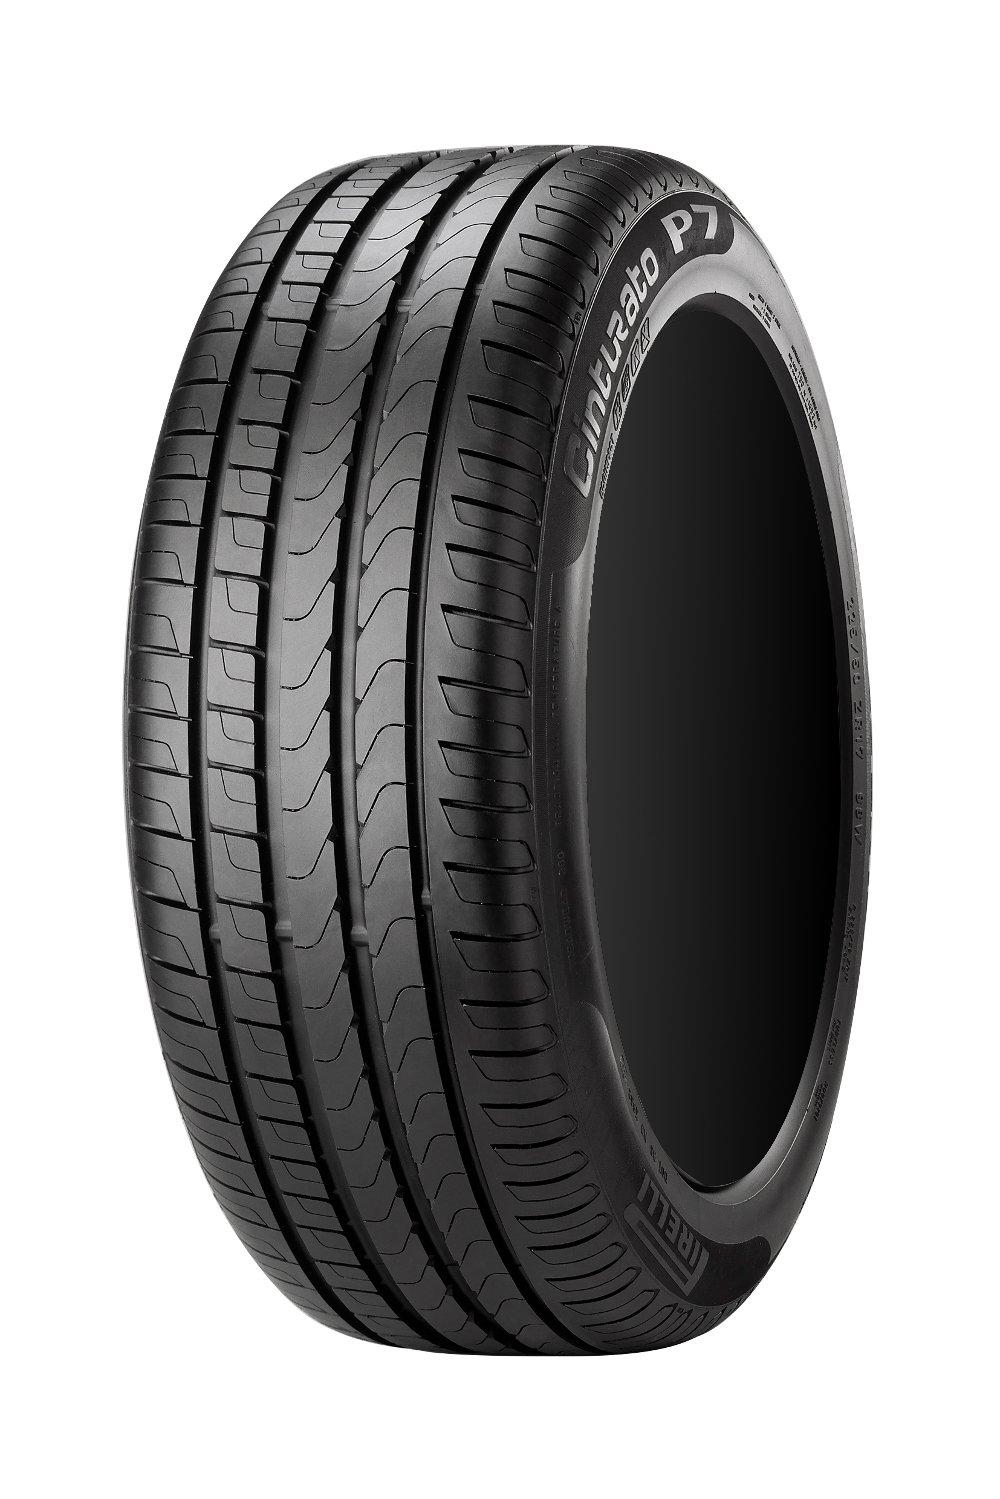 PIRELLI(ピレリ) サマータイヤ Cinturato P7 245/40R18 97Y XL ランフラット MOE [メルセデスベンツ承認] B06XT2YMVN